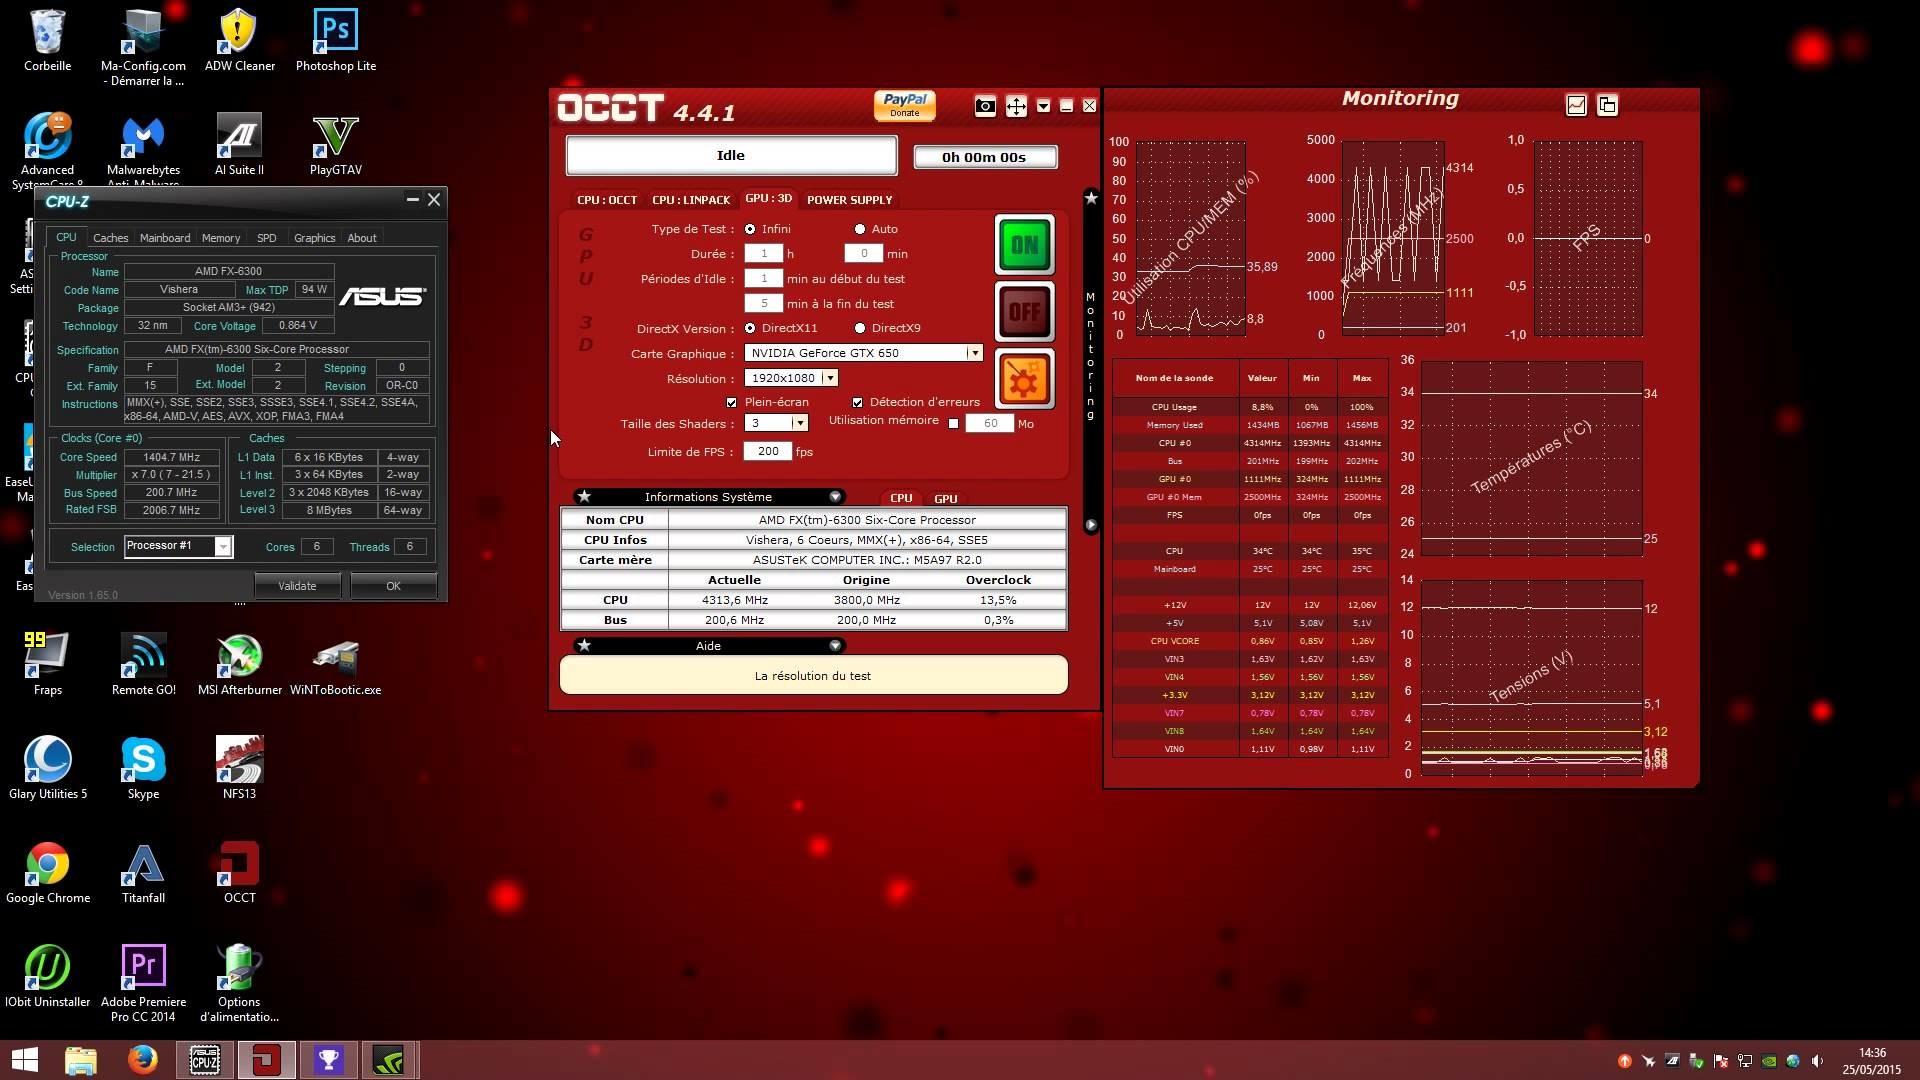 [TUTO] Overclocker son AMD FX 6300 ou autres processeurs